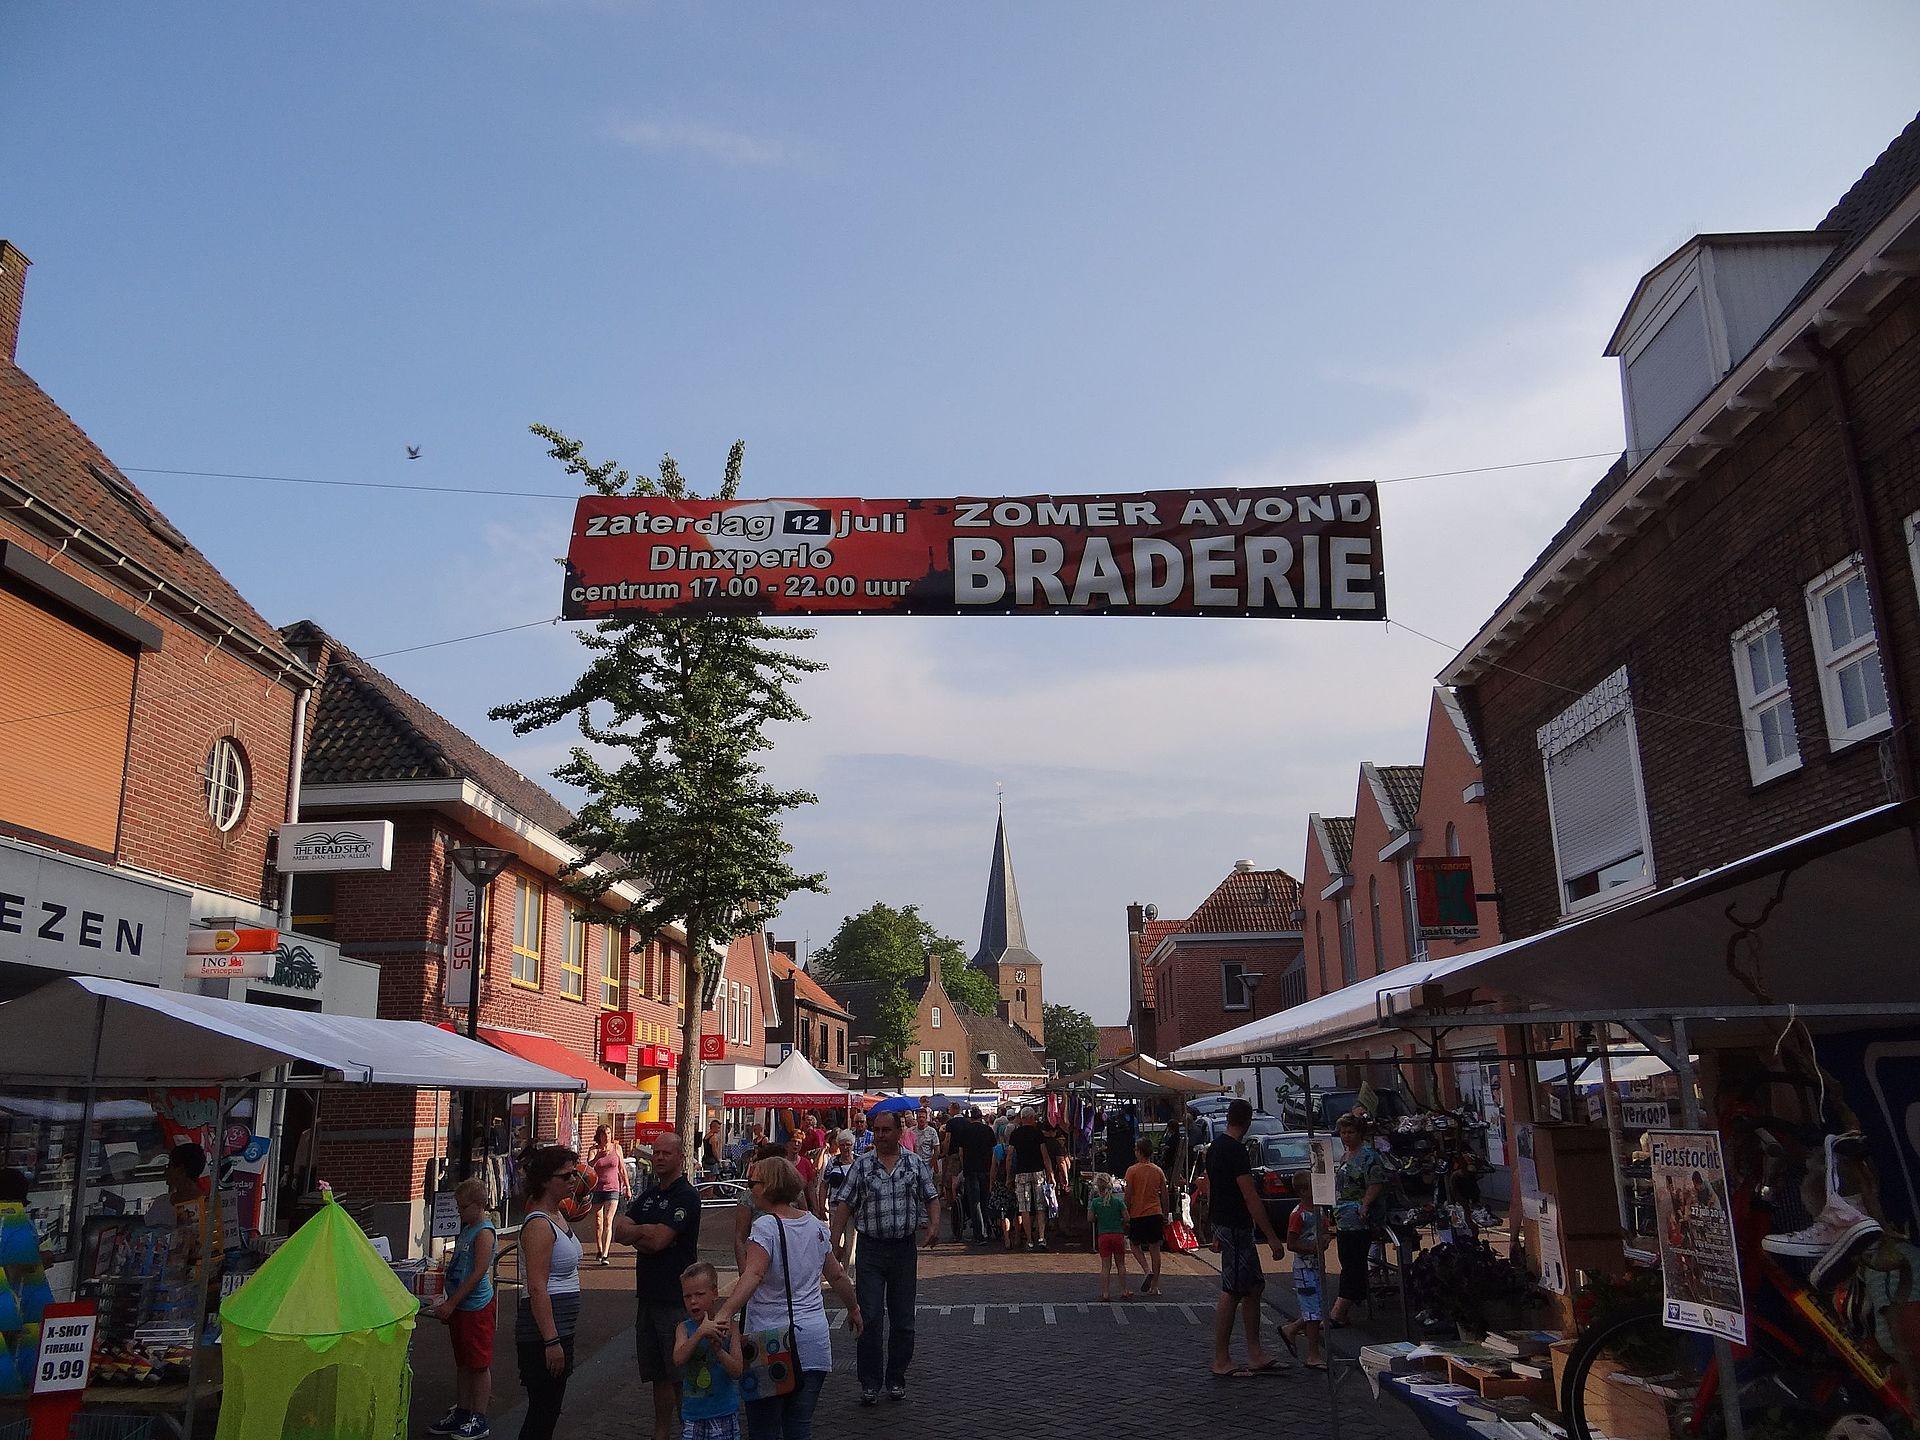 Braderie - Wikipedia